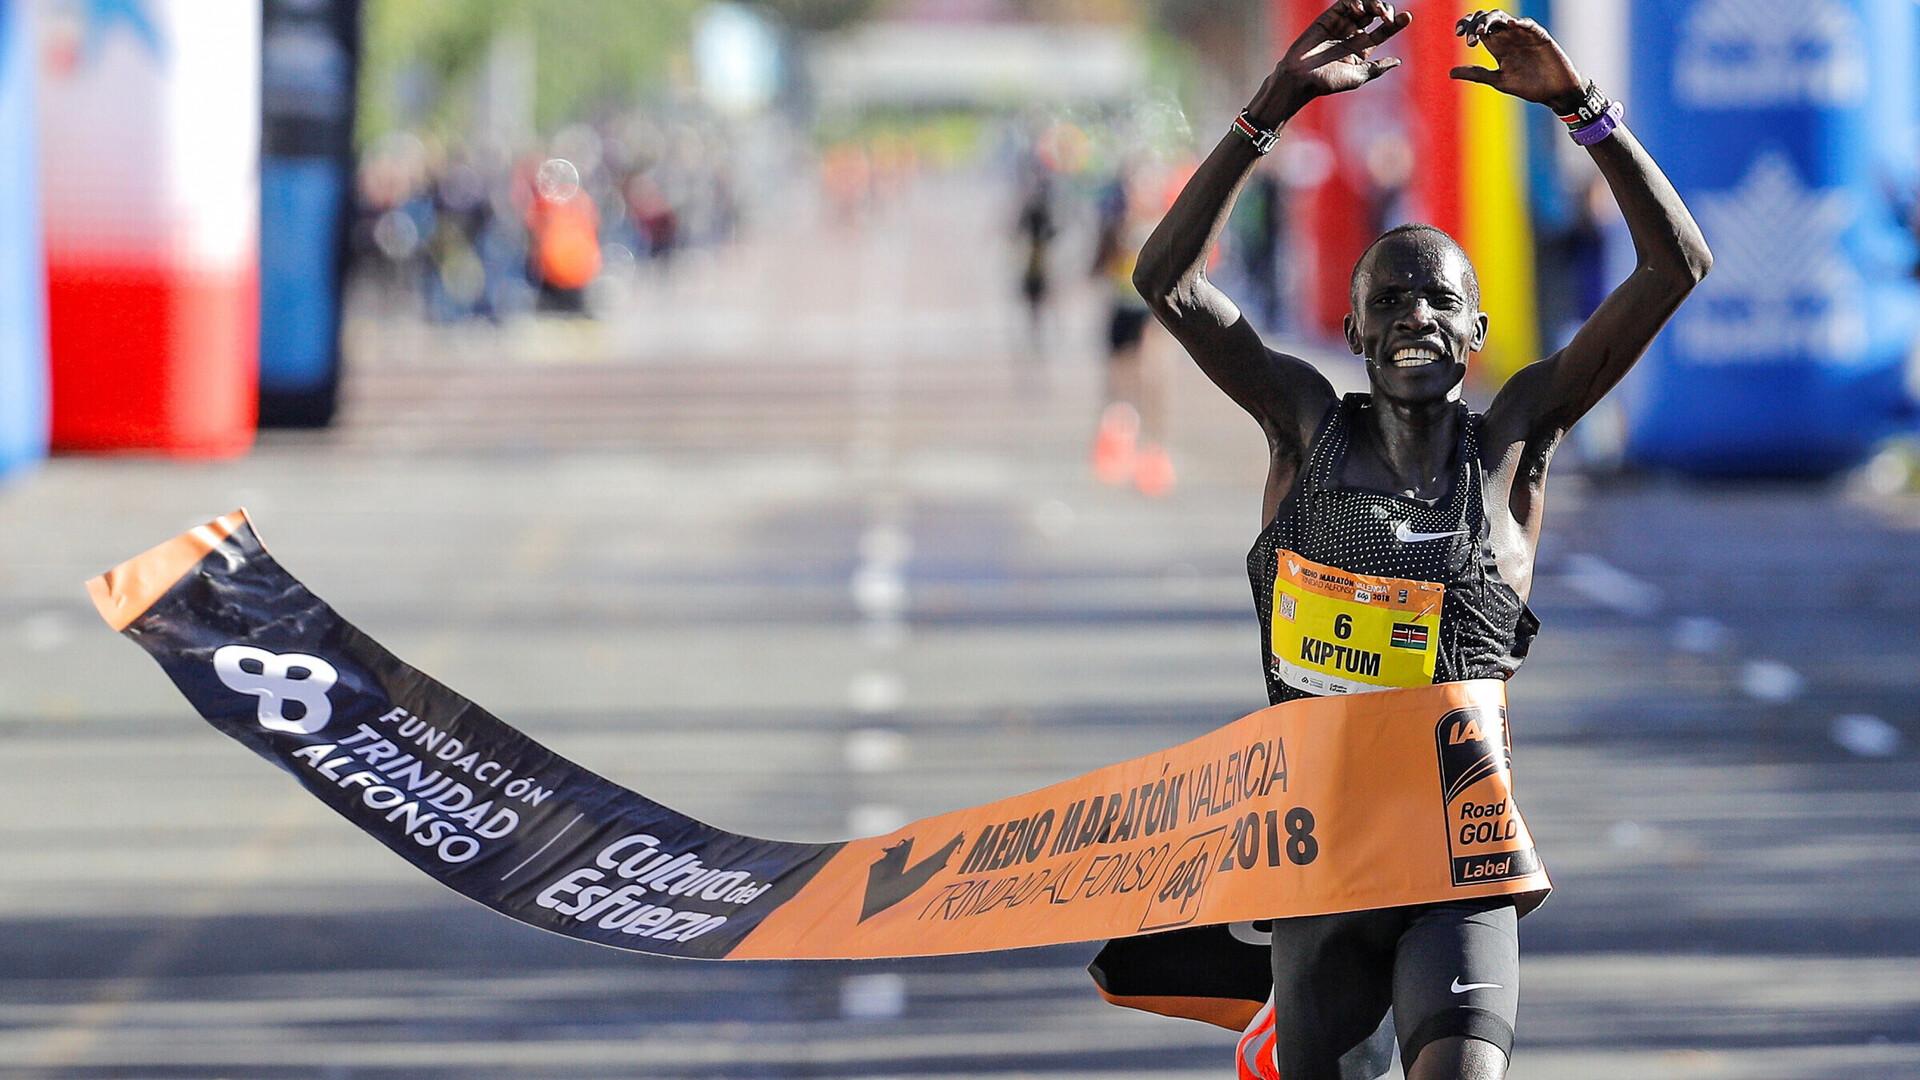 Keenia jooksumees uuendas maailmarekordit  a8dc4b6f5b